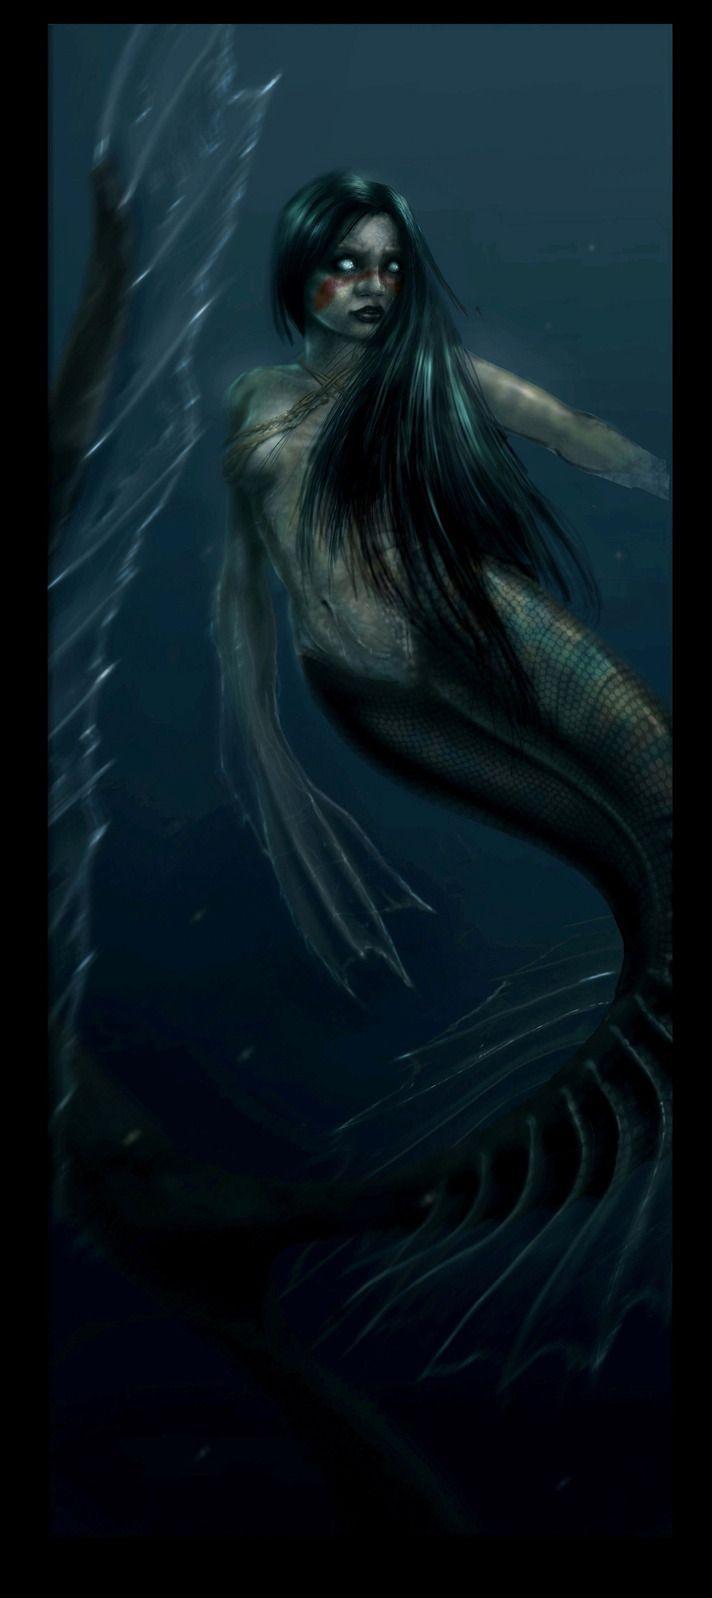 Pin by Amethystine Acolyte on lovecraft | Mermaid ...